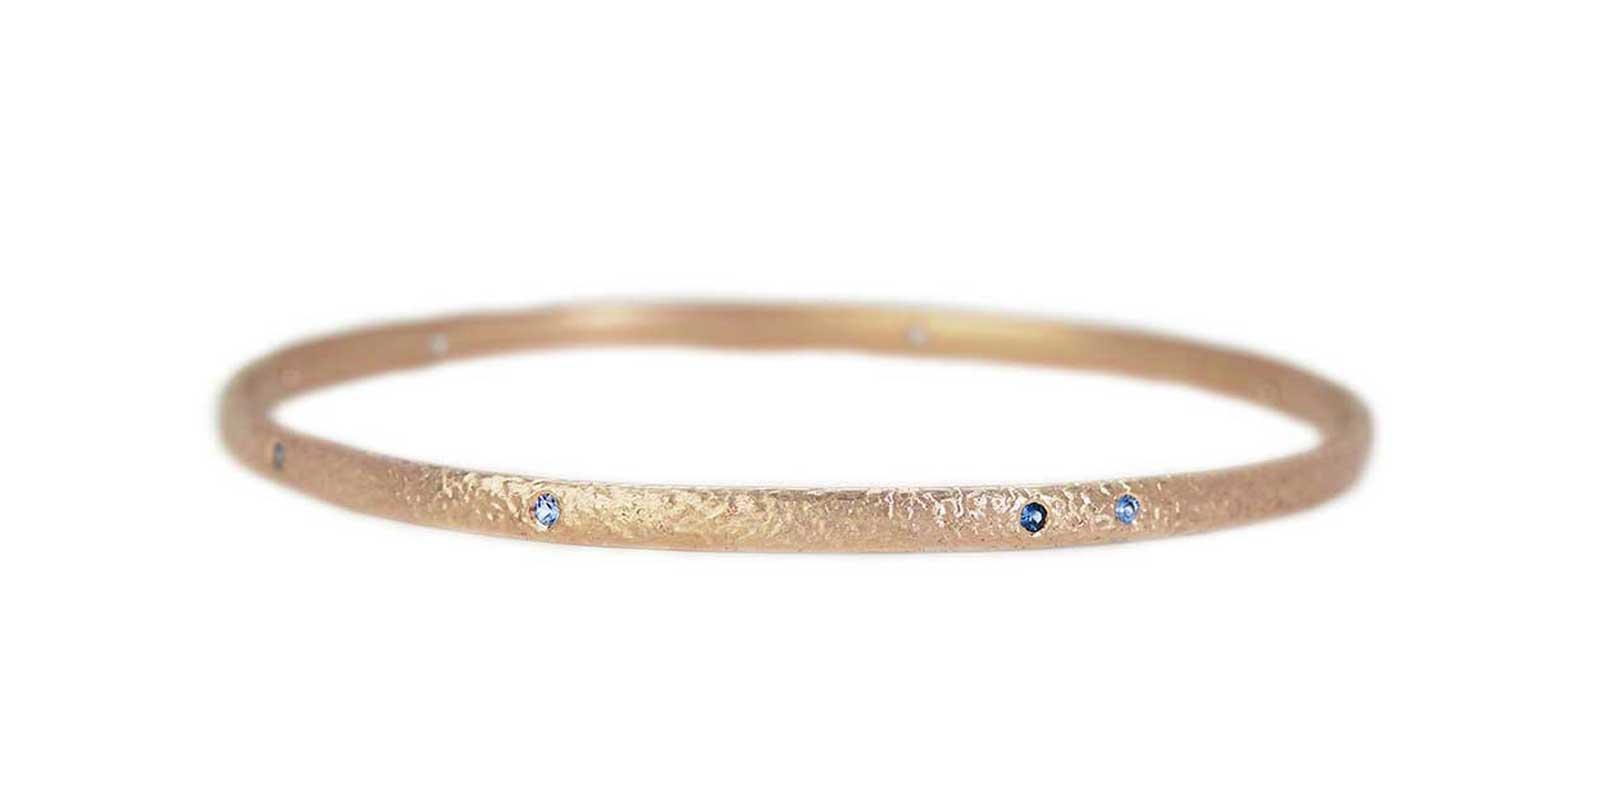 Sapphire Textured Bangle